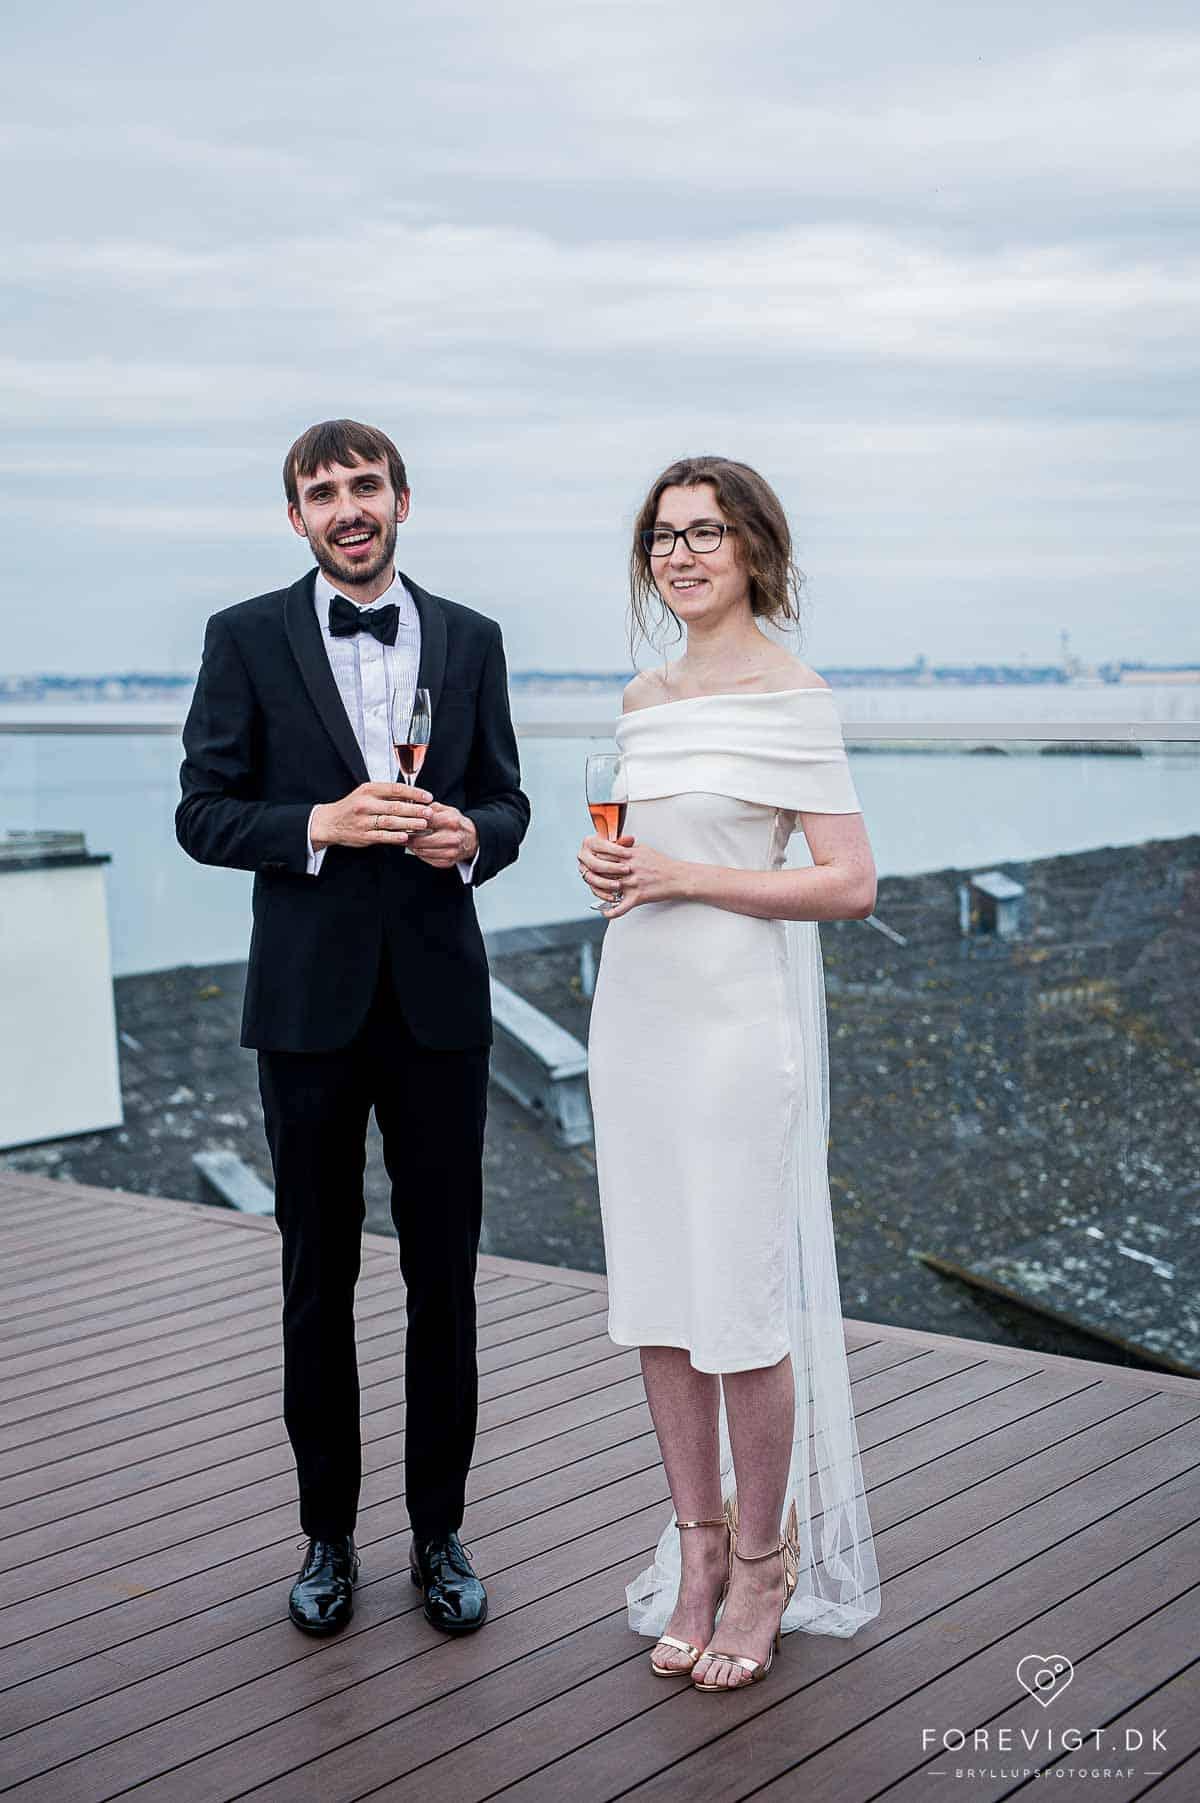 Bryllupslokaler i København og omegn - Mine tips om bryllup